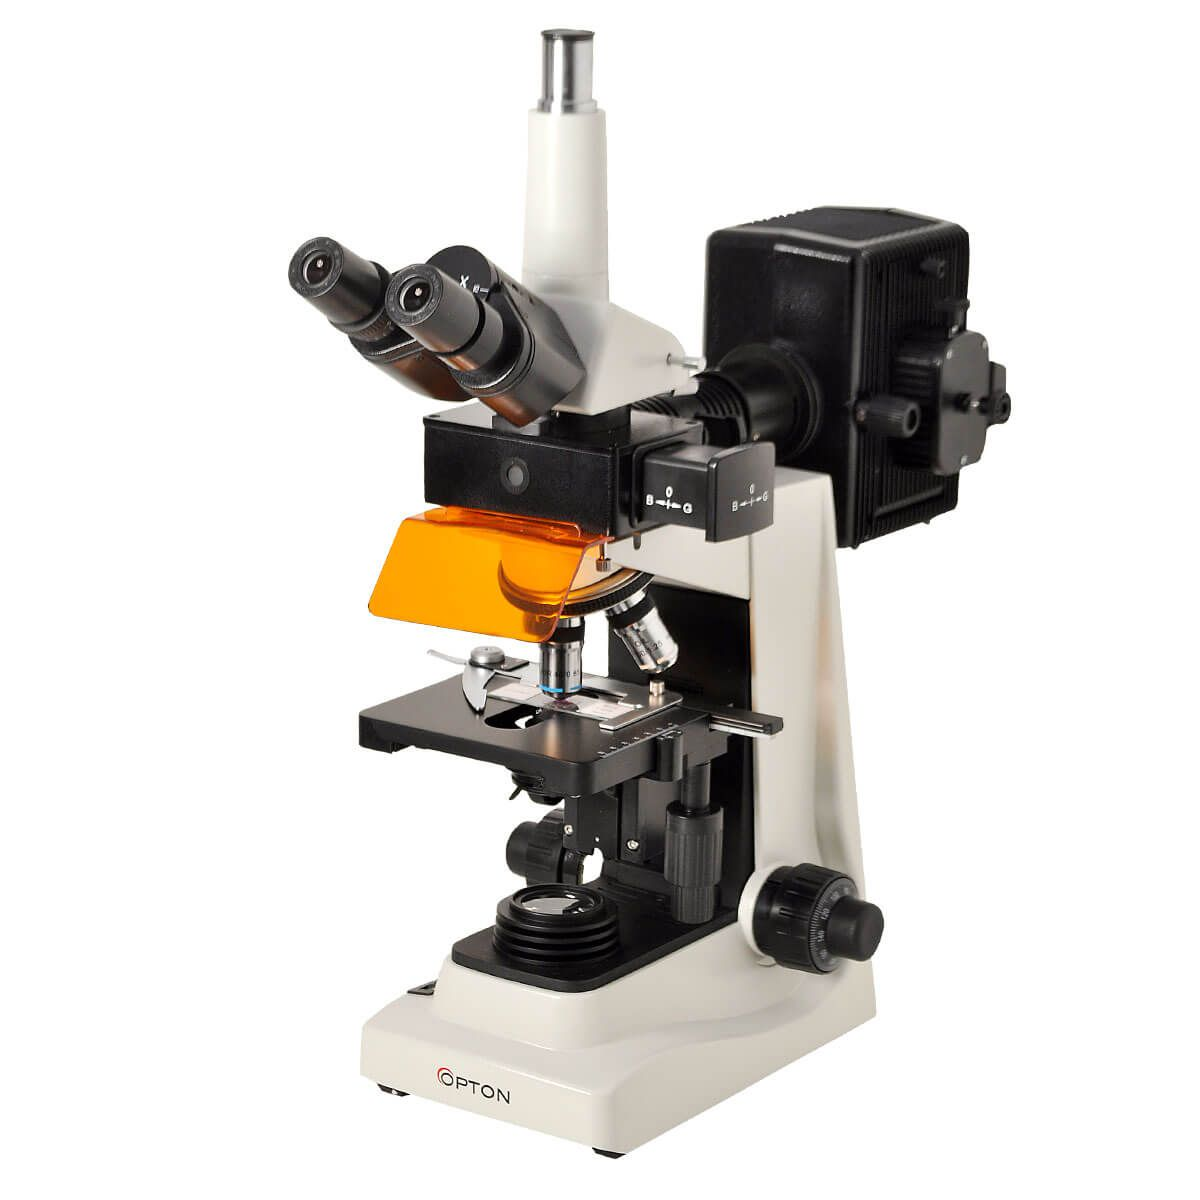 Microscópio Trinocular Fluorescência 40x até 1600x Objetiva Planacromática E Iluminação Epscópica 100w Hbo/diascópica 20w Halogênio